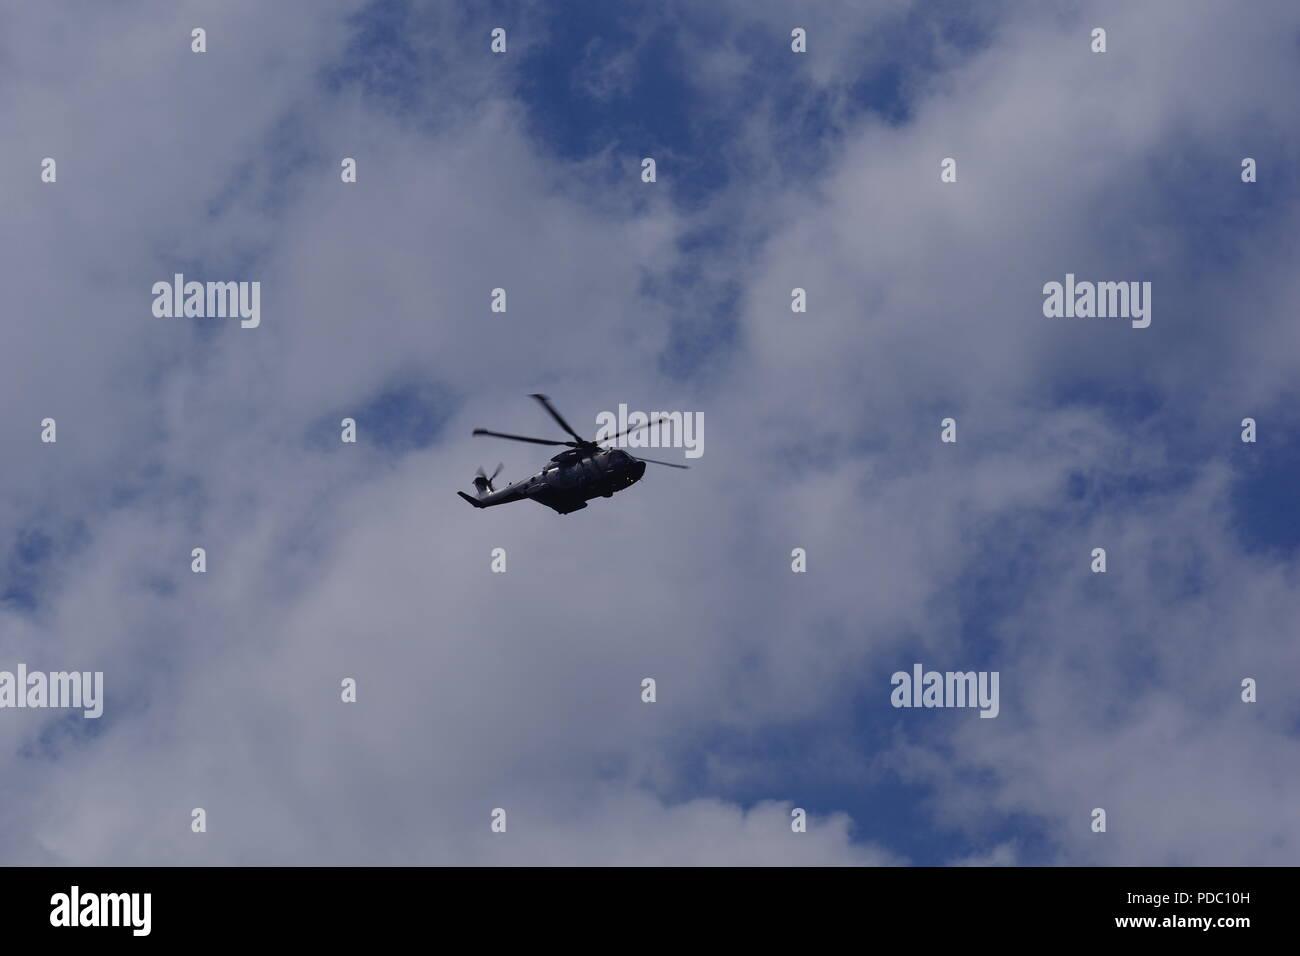 British Military Helicopter Flying over Dawlish Warren, Devon, UK. August, 2018. - Stock Image